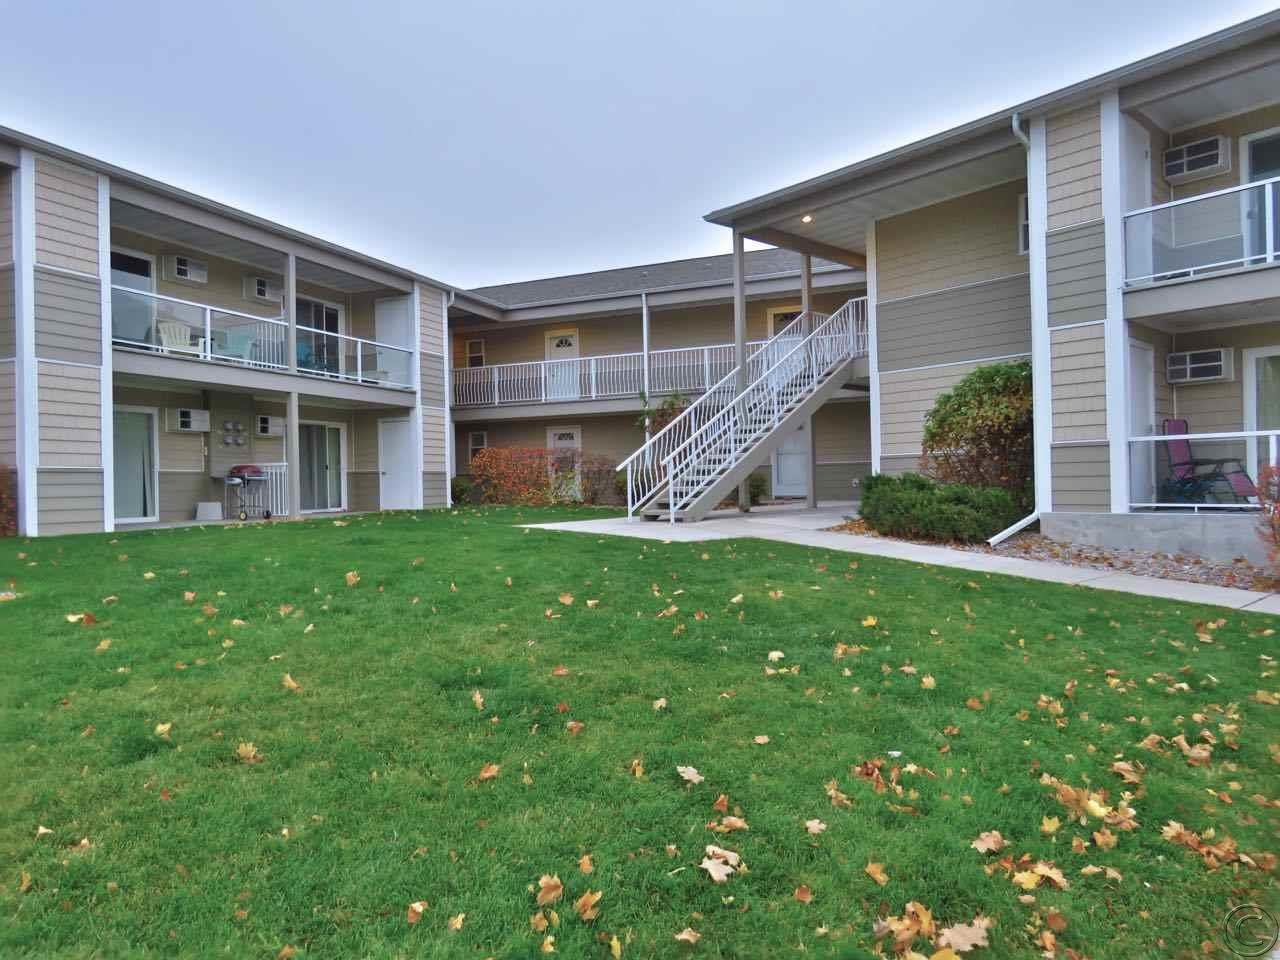 Real Estate for Sale, ListingId: 36221973, Polson,MT59860